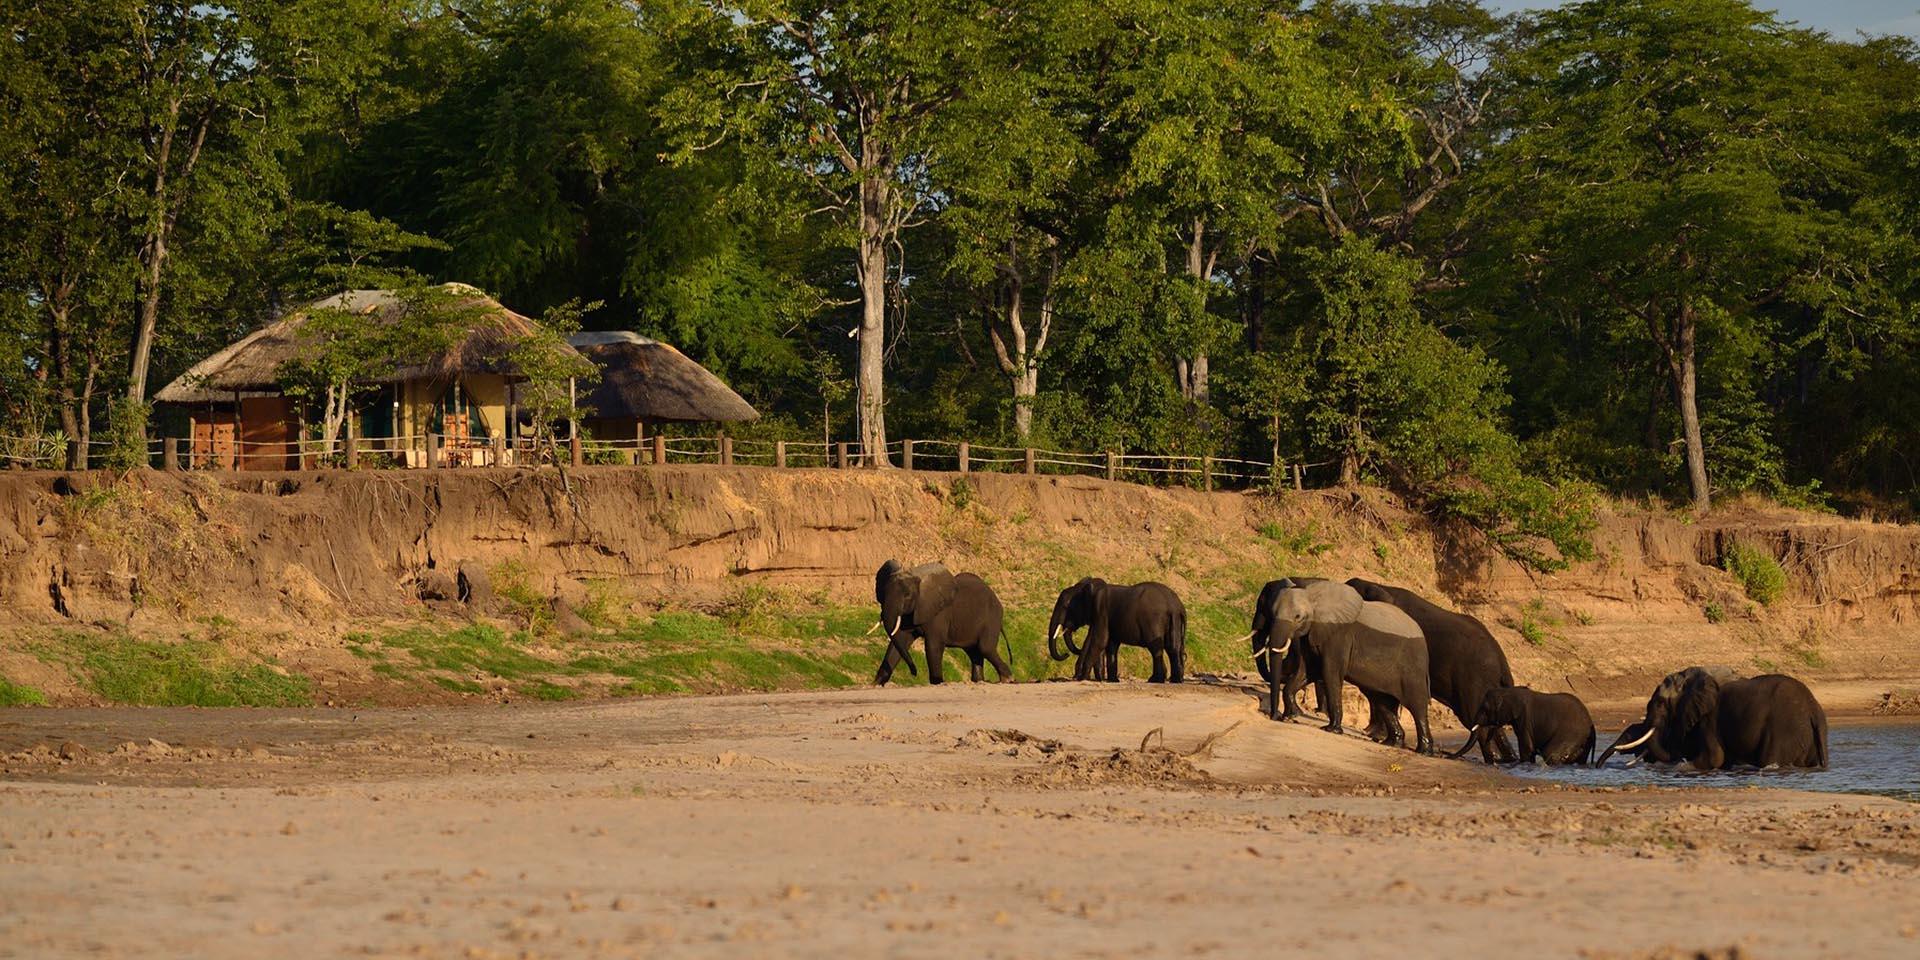 zambia bush-beach-safaris-tours-malawian-style-malawi-adventures-experiences-specialist-tour-operator-wildlife-camp-south-luangwa-elephants-walking